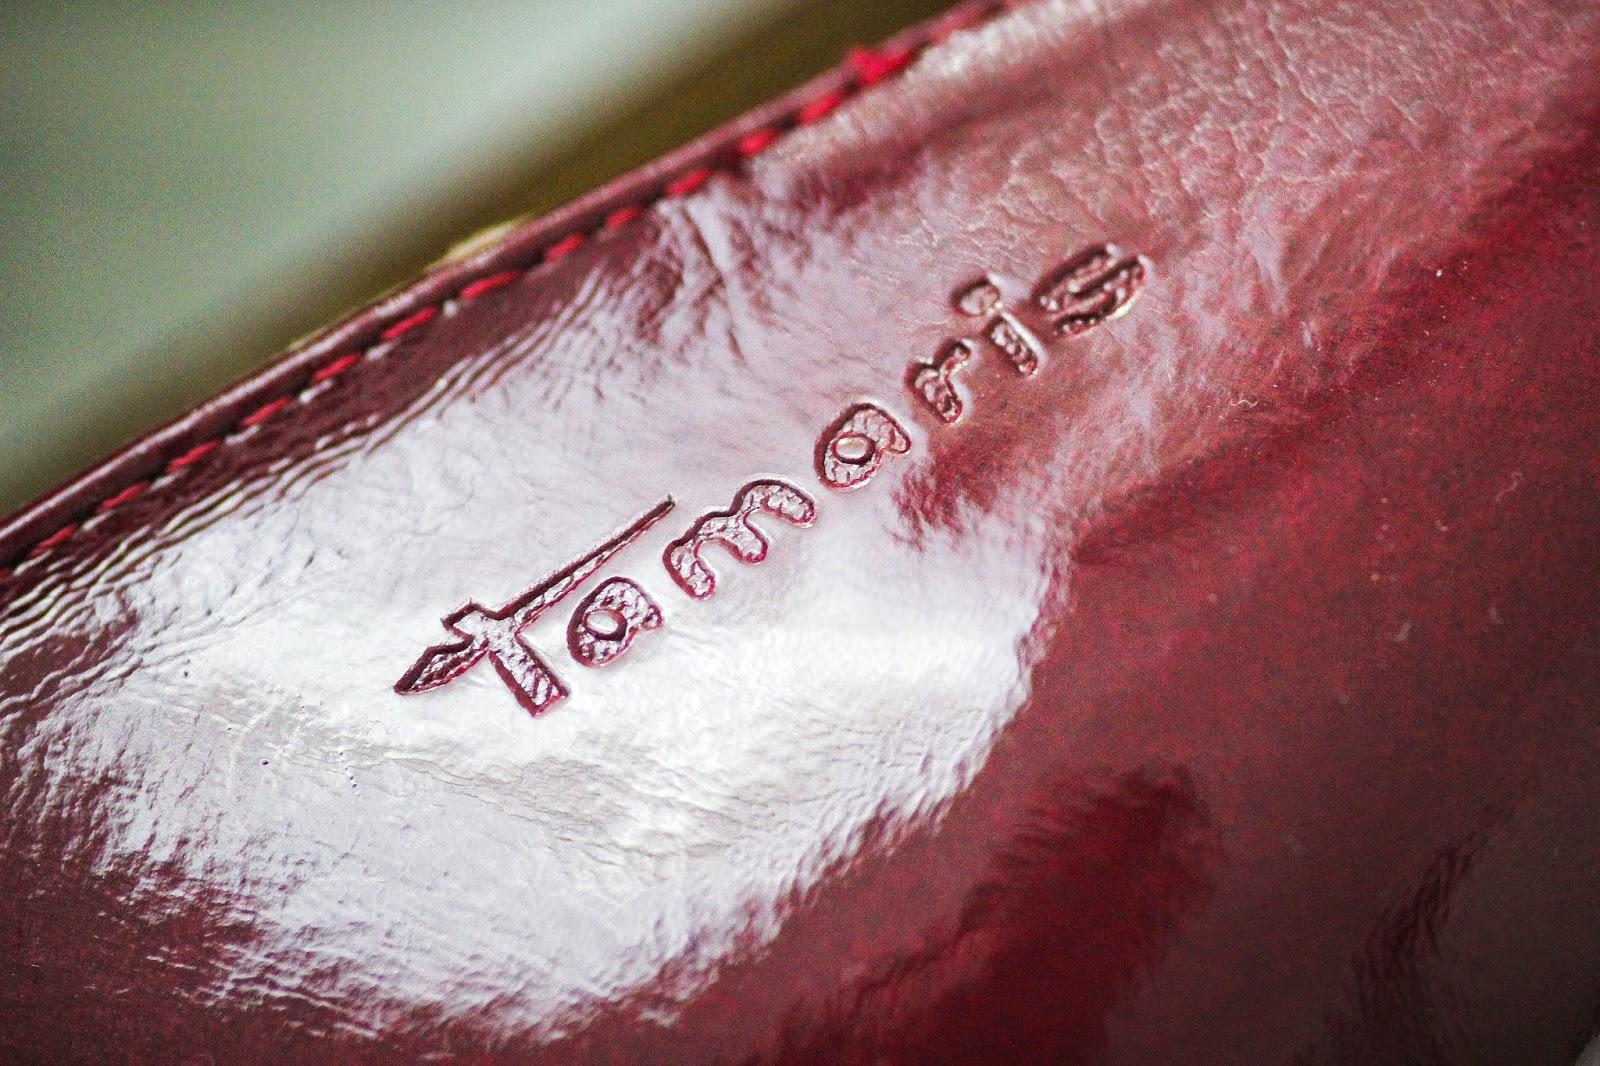 SHOES: TAMARAS SHOES RED PUMPS PRIZMAHFASHION